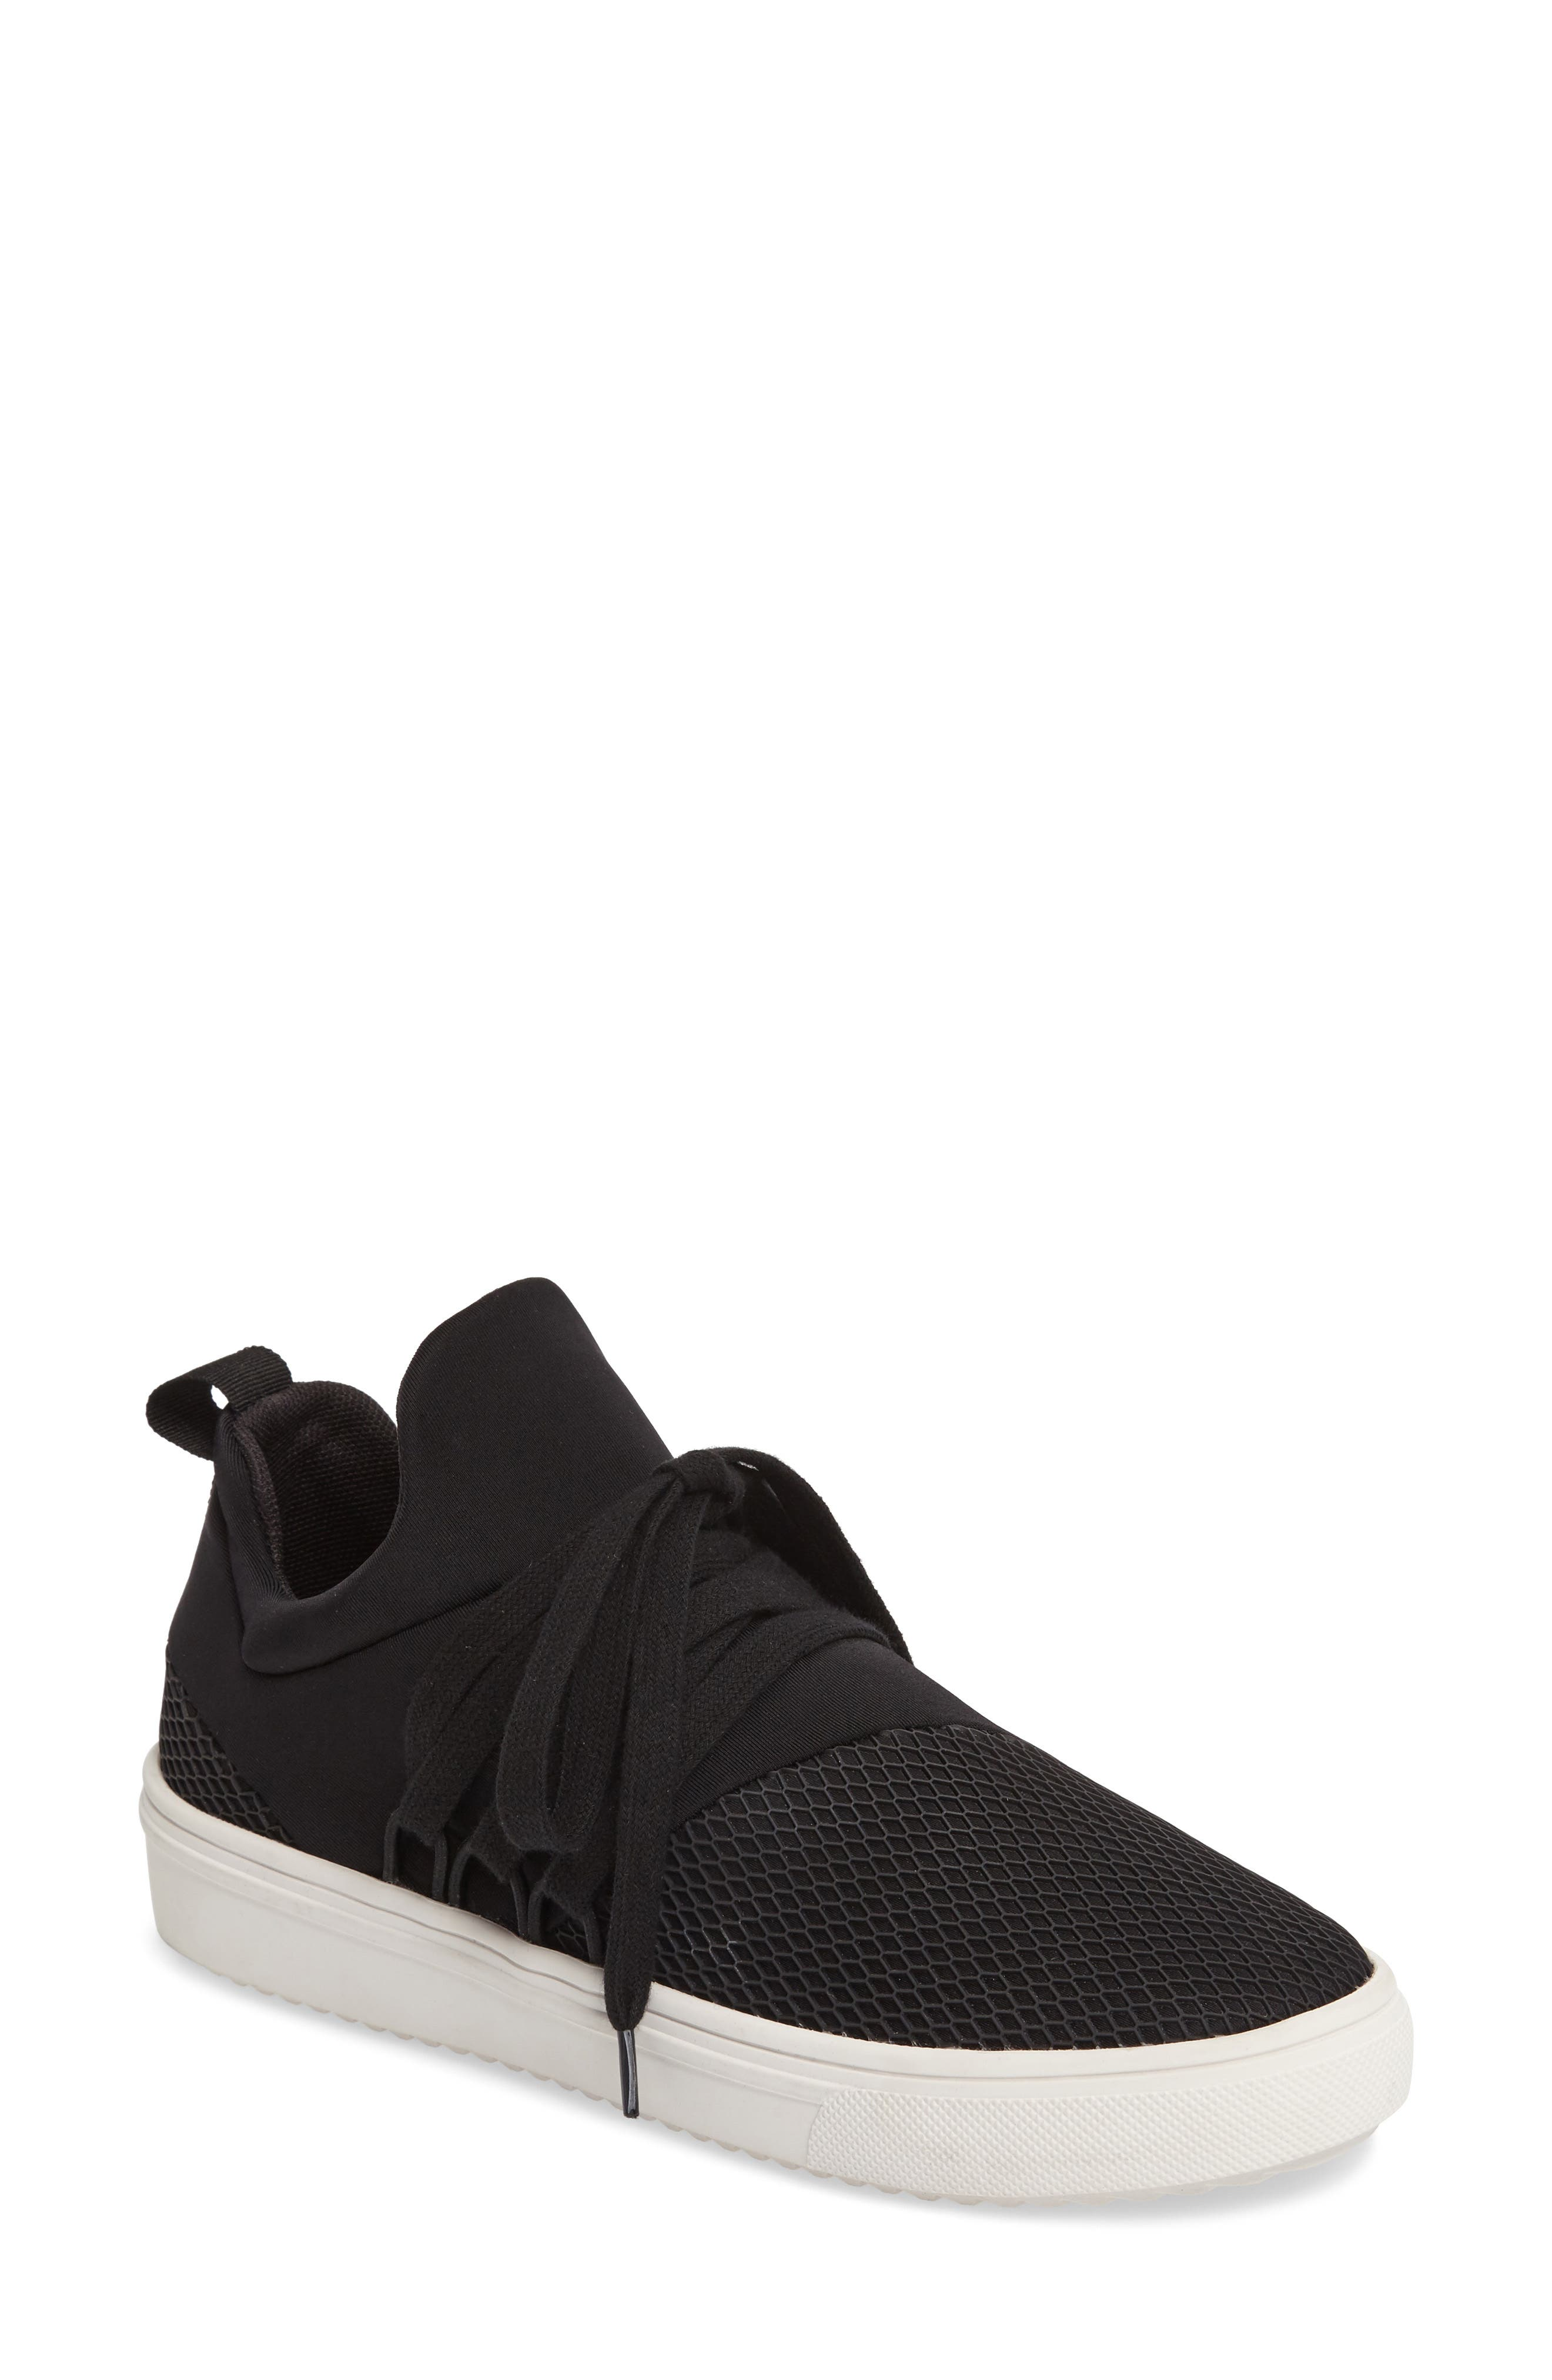 Lancer Sneaker,                             Main thumbnail 1, color,                             BLACK